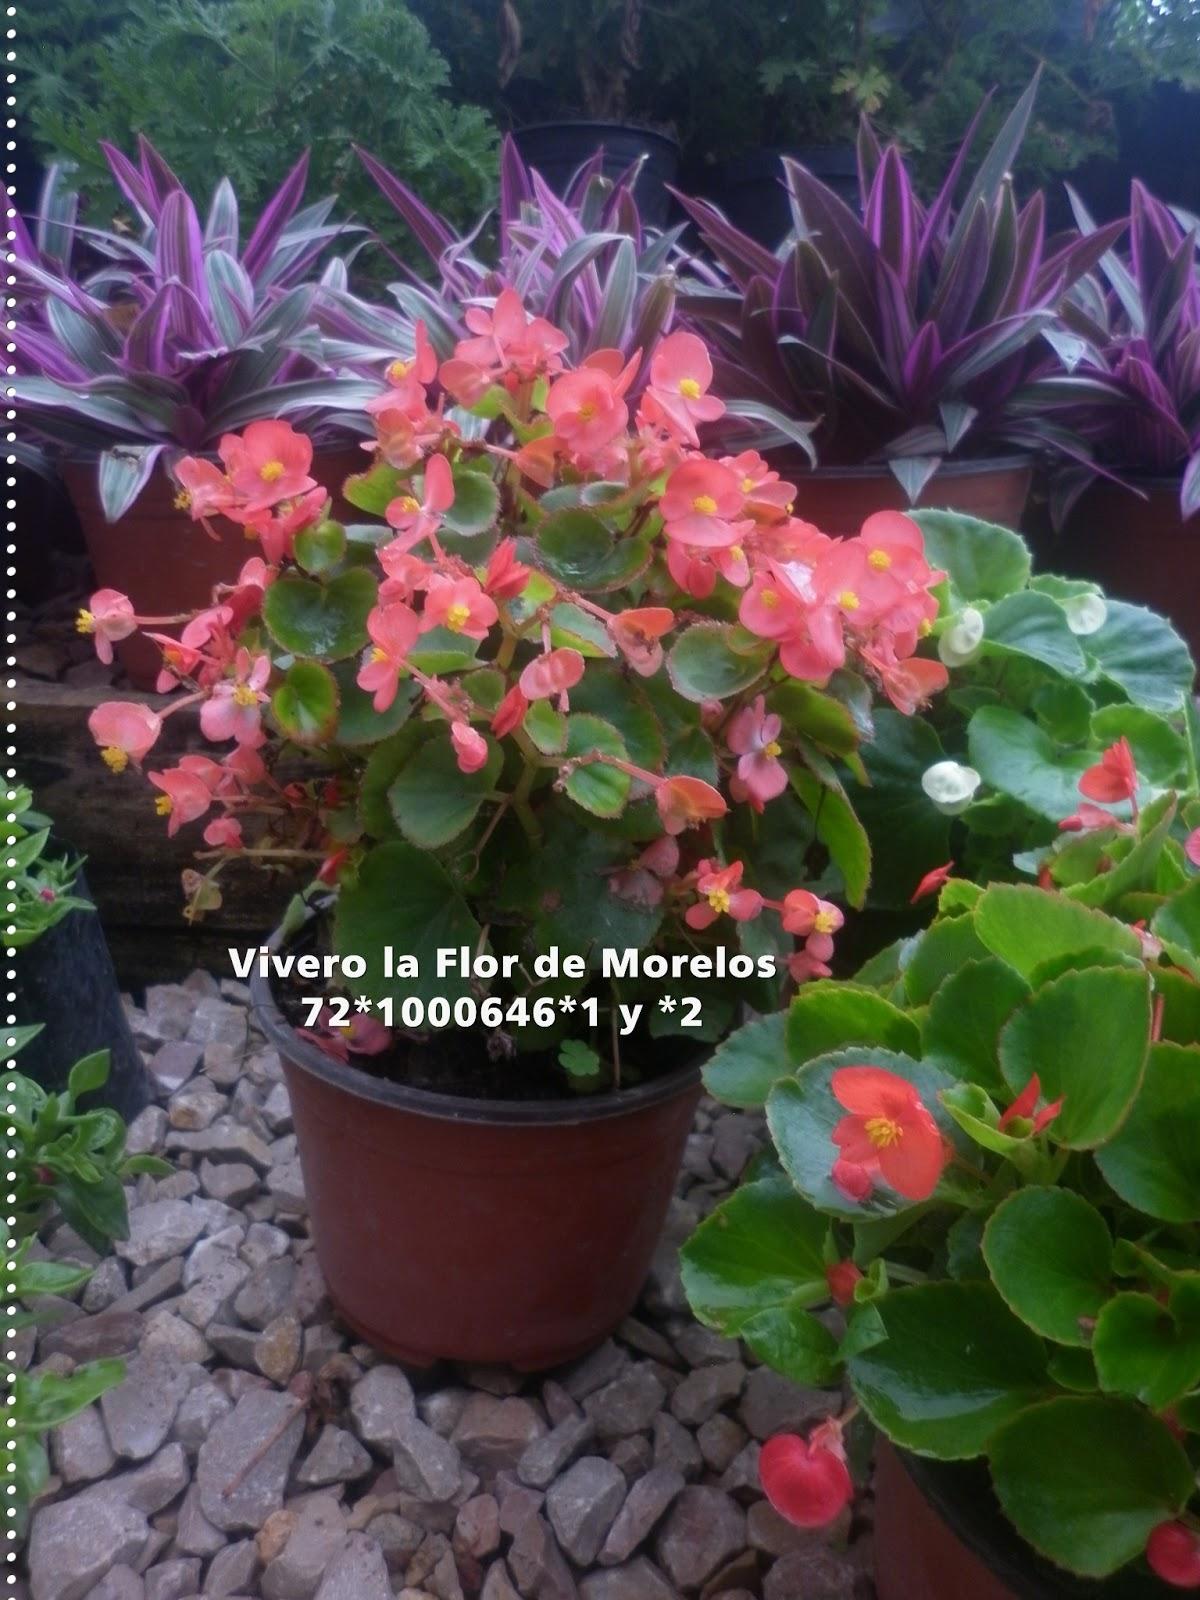 Vivero la flor de morelos flores temporada de diversas for Plantas temporada